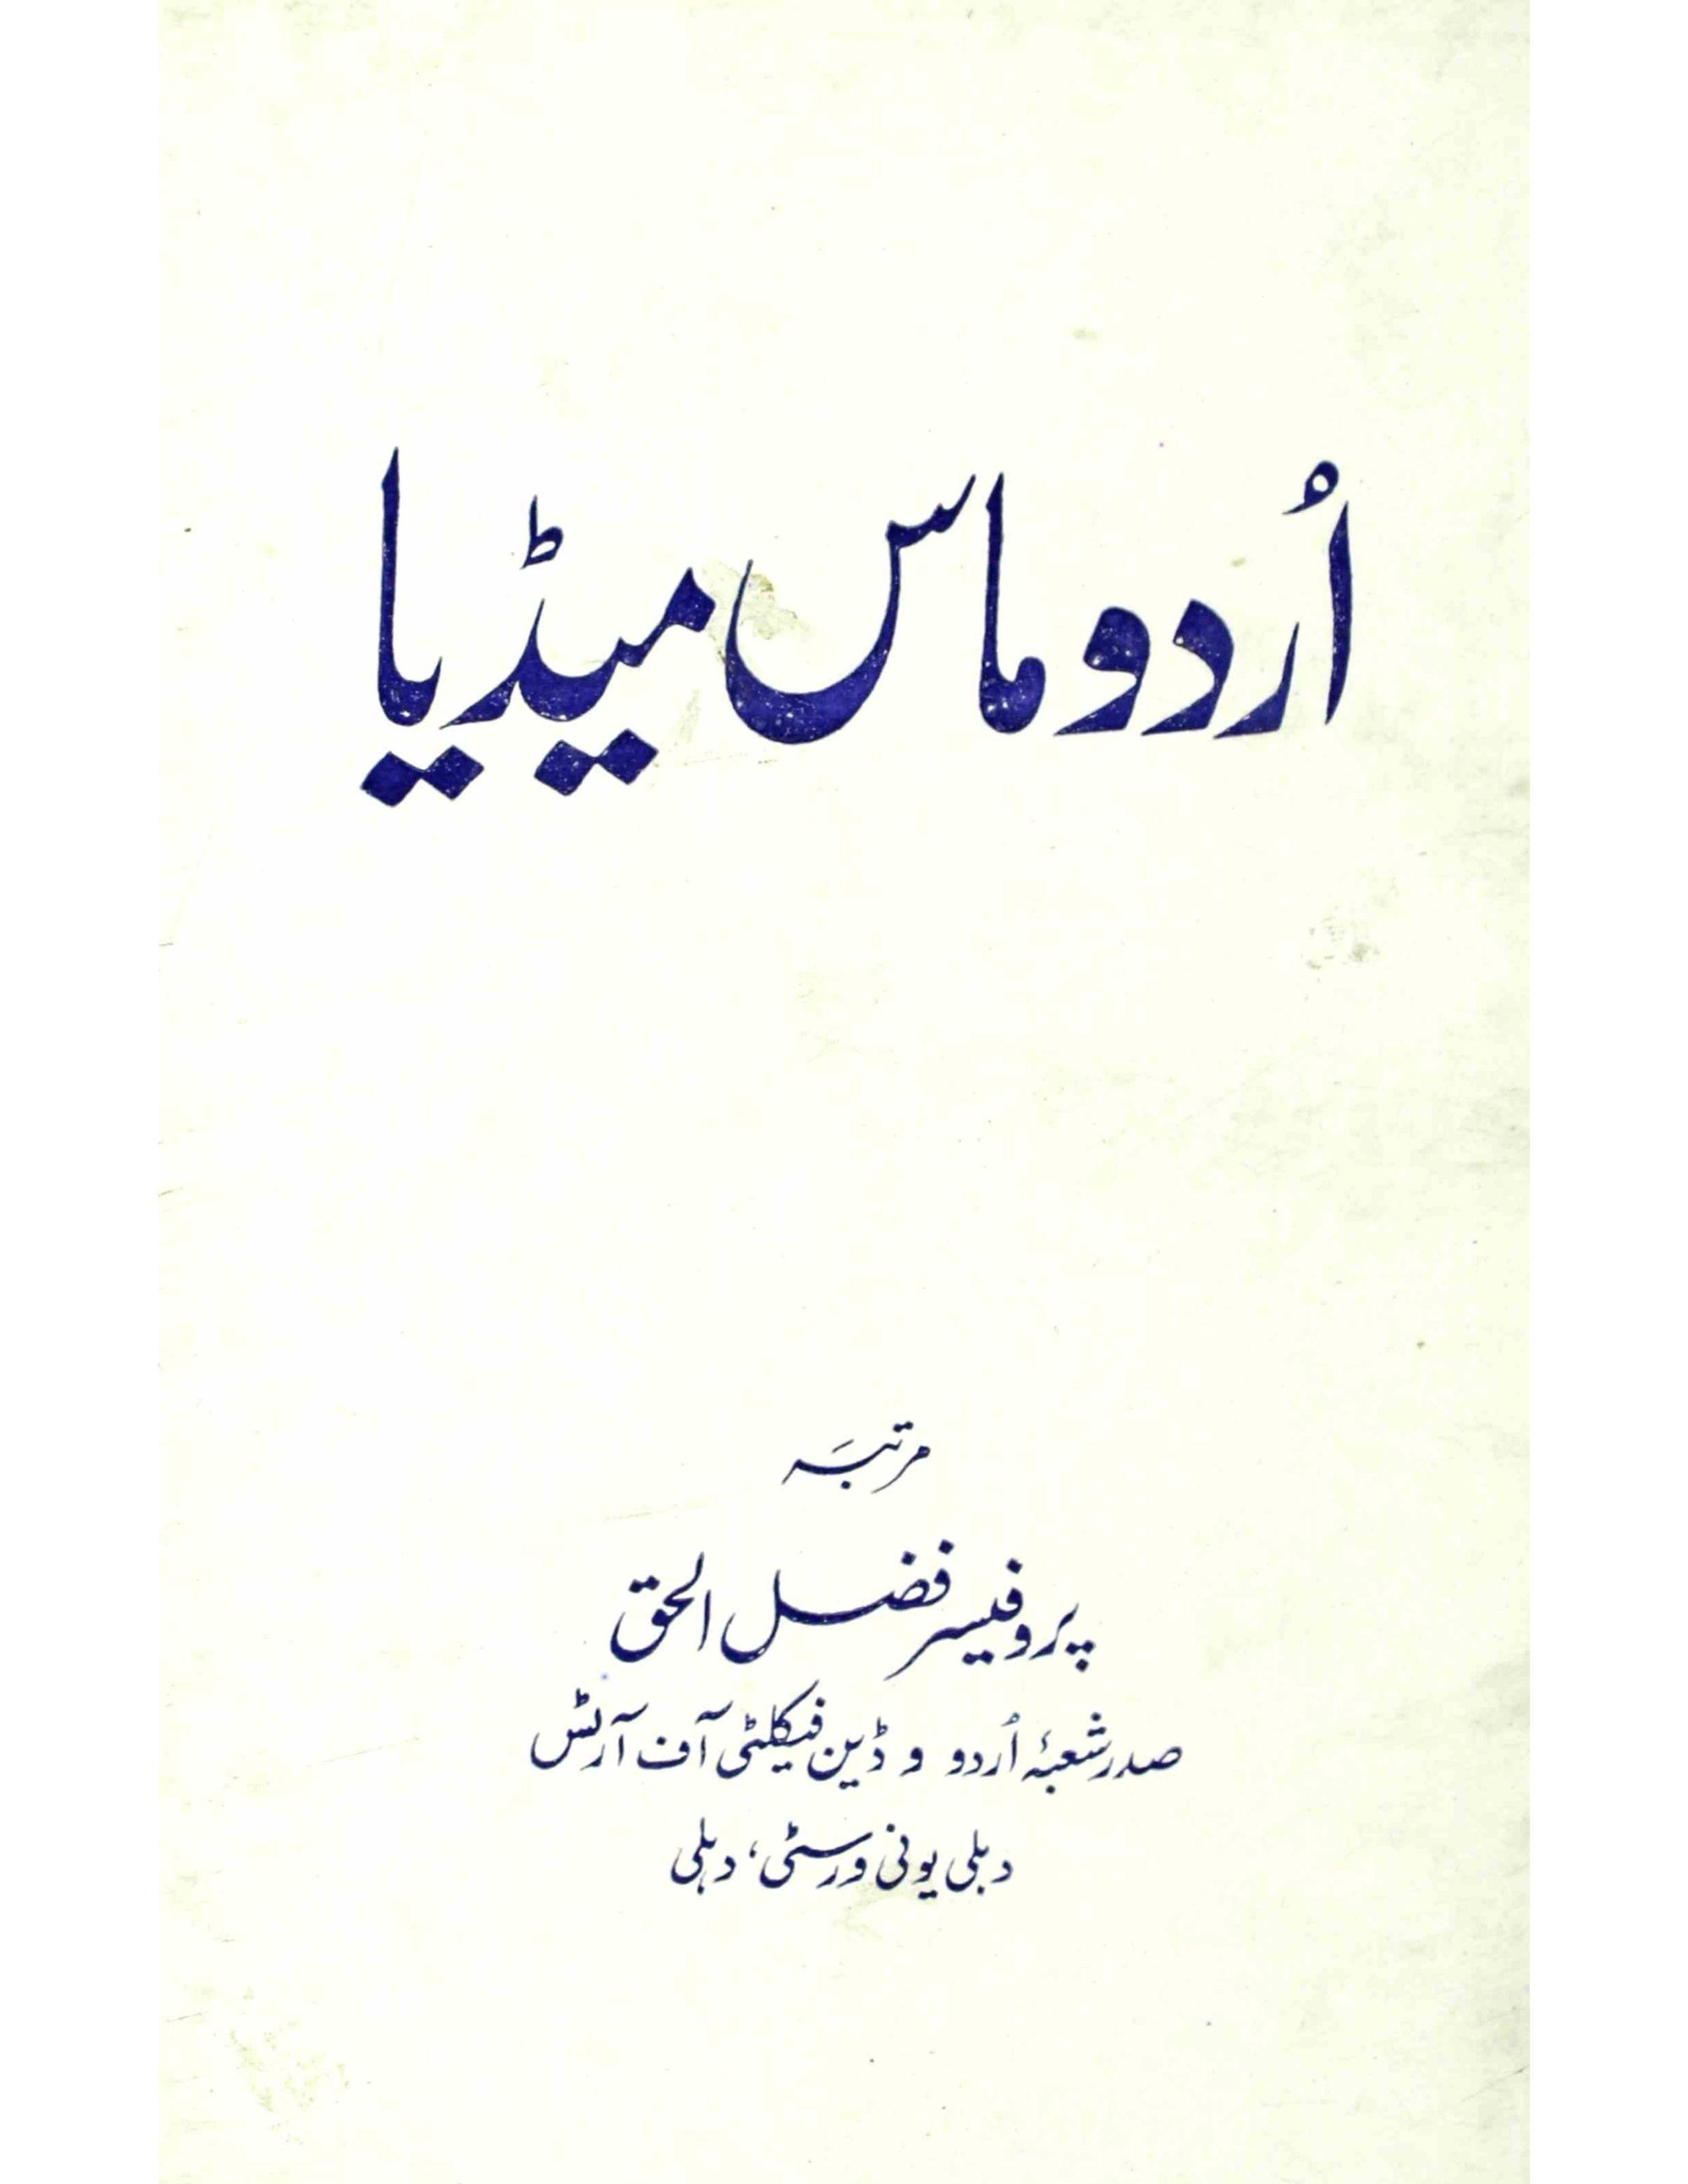 Urdu Mass Media